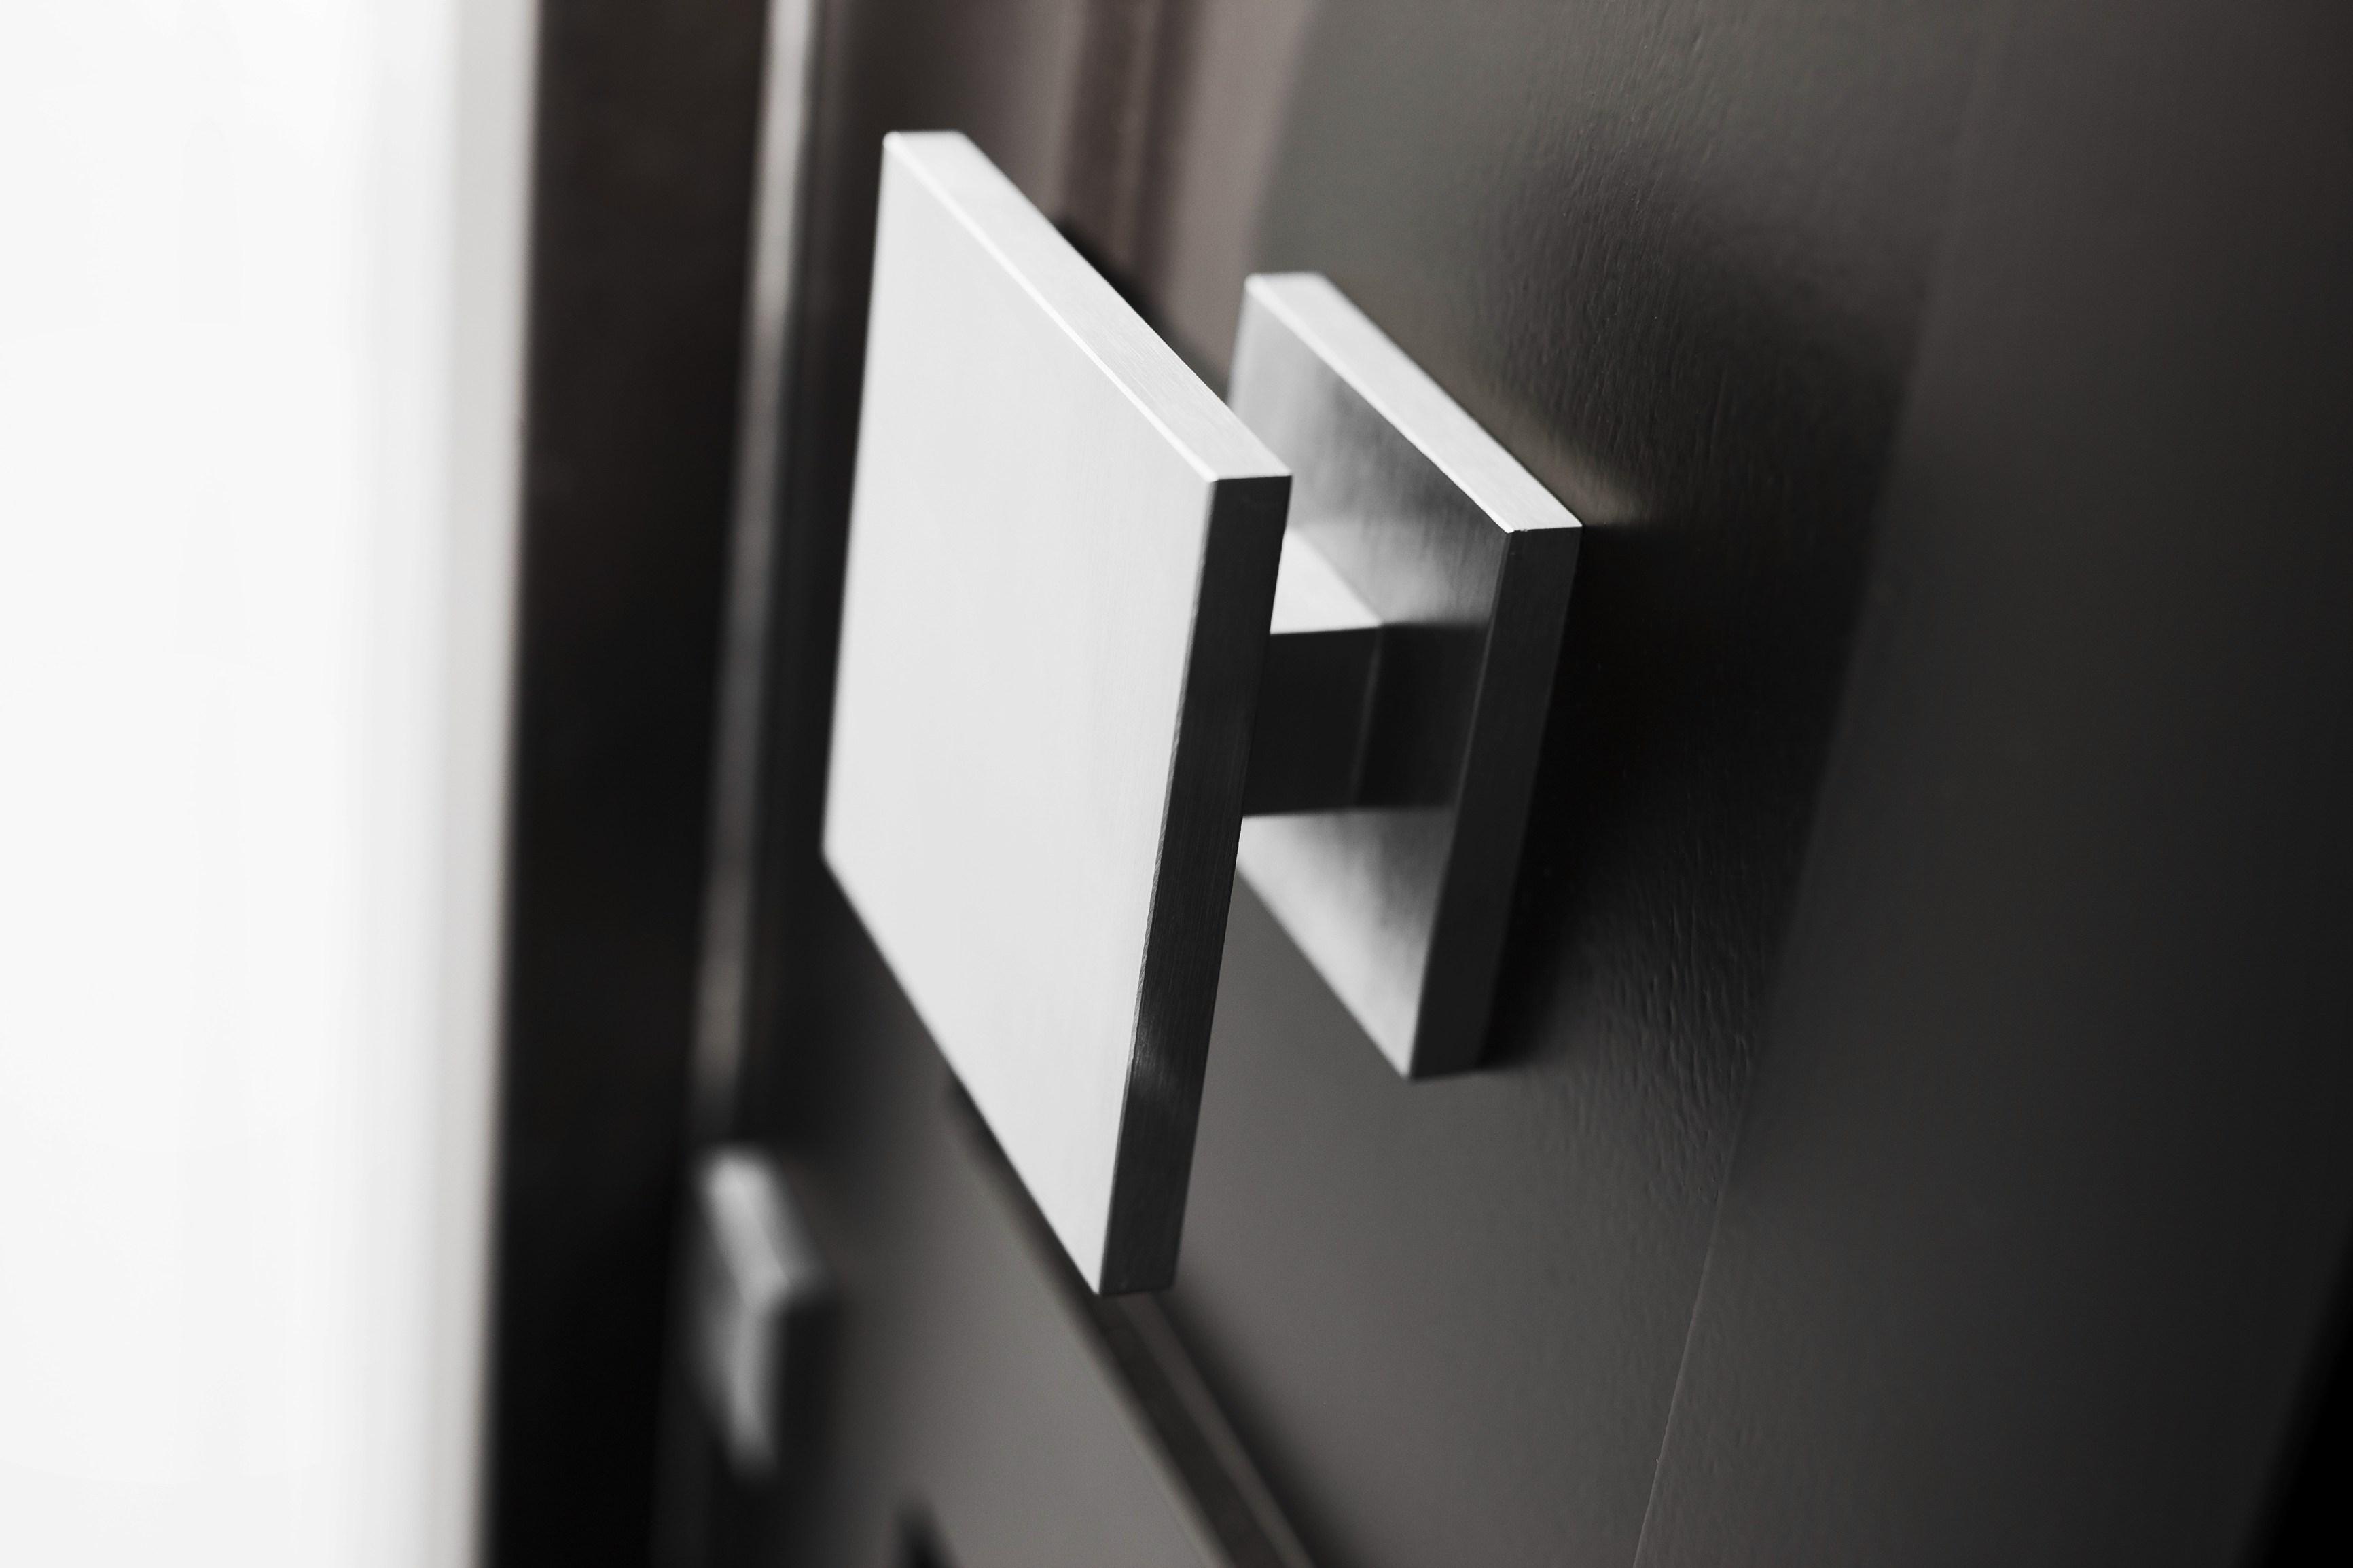 square door knobs photo - 18